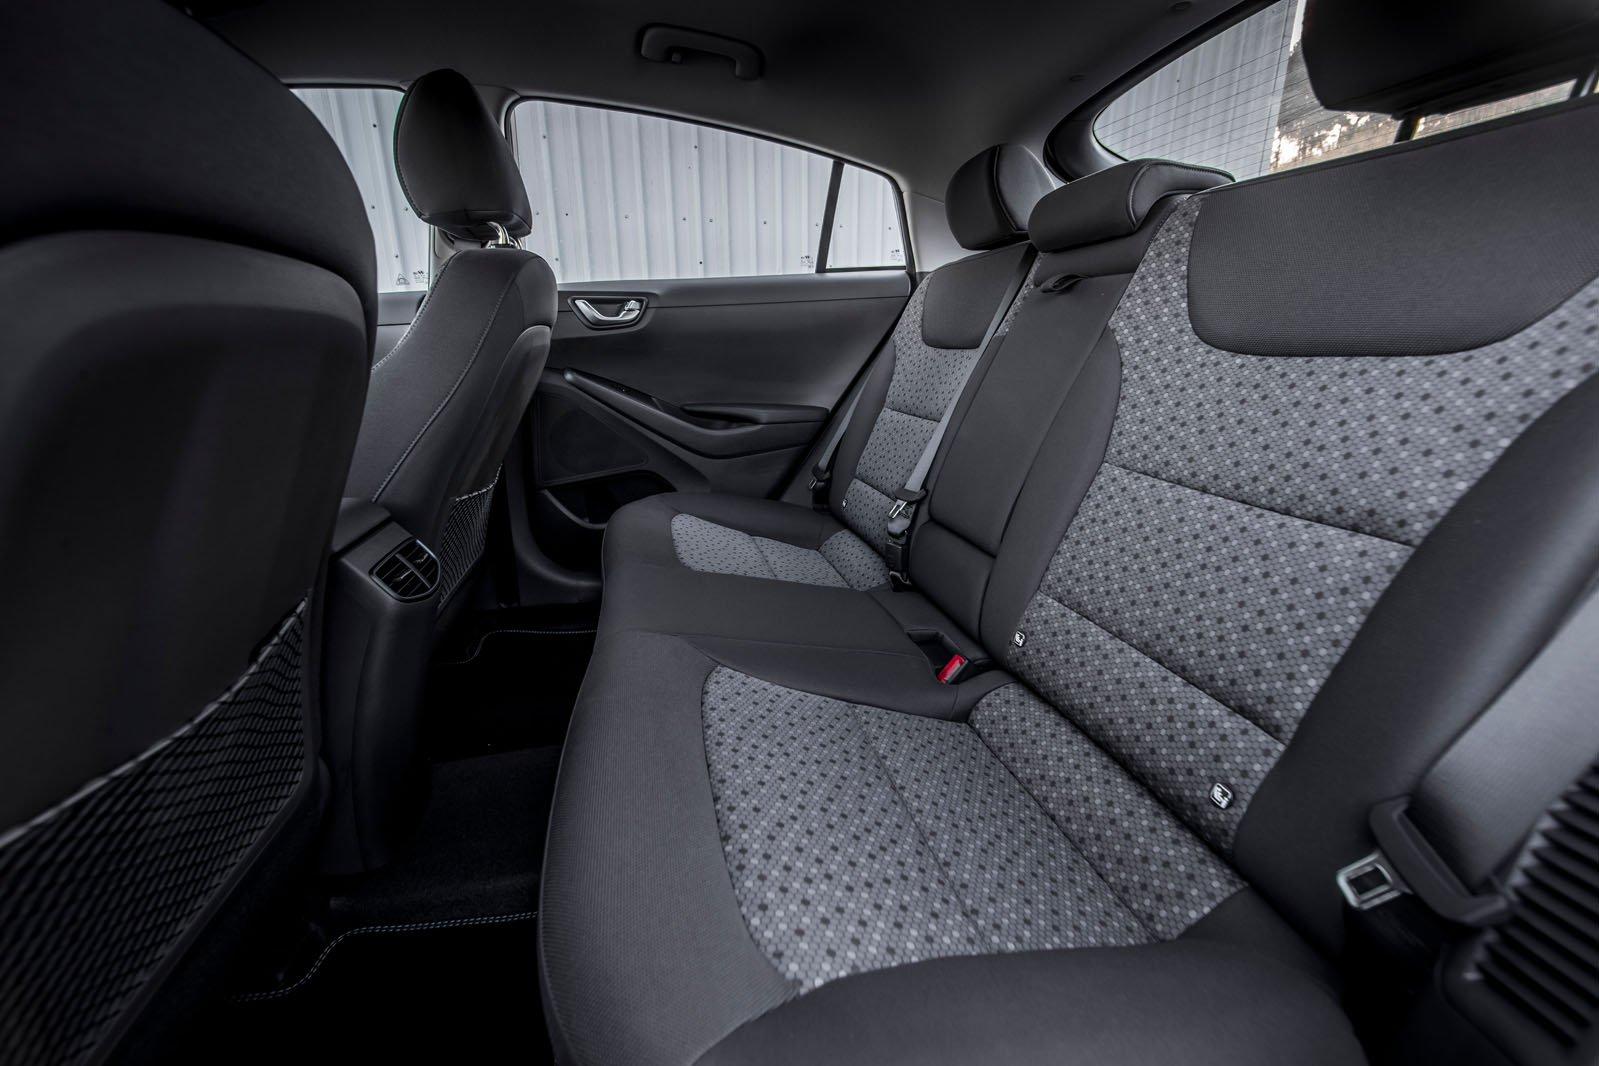 Hyundai Ioniq 2018 rear seats